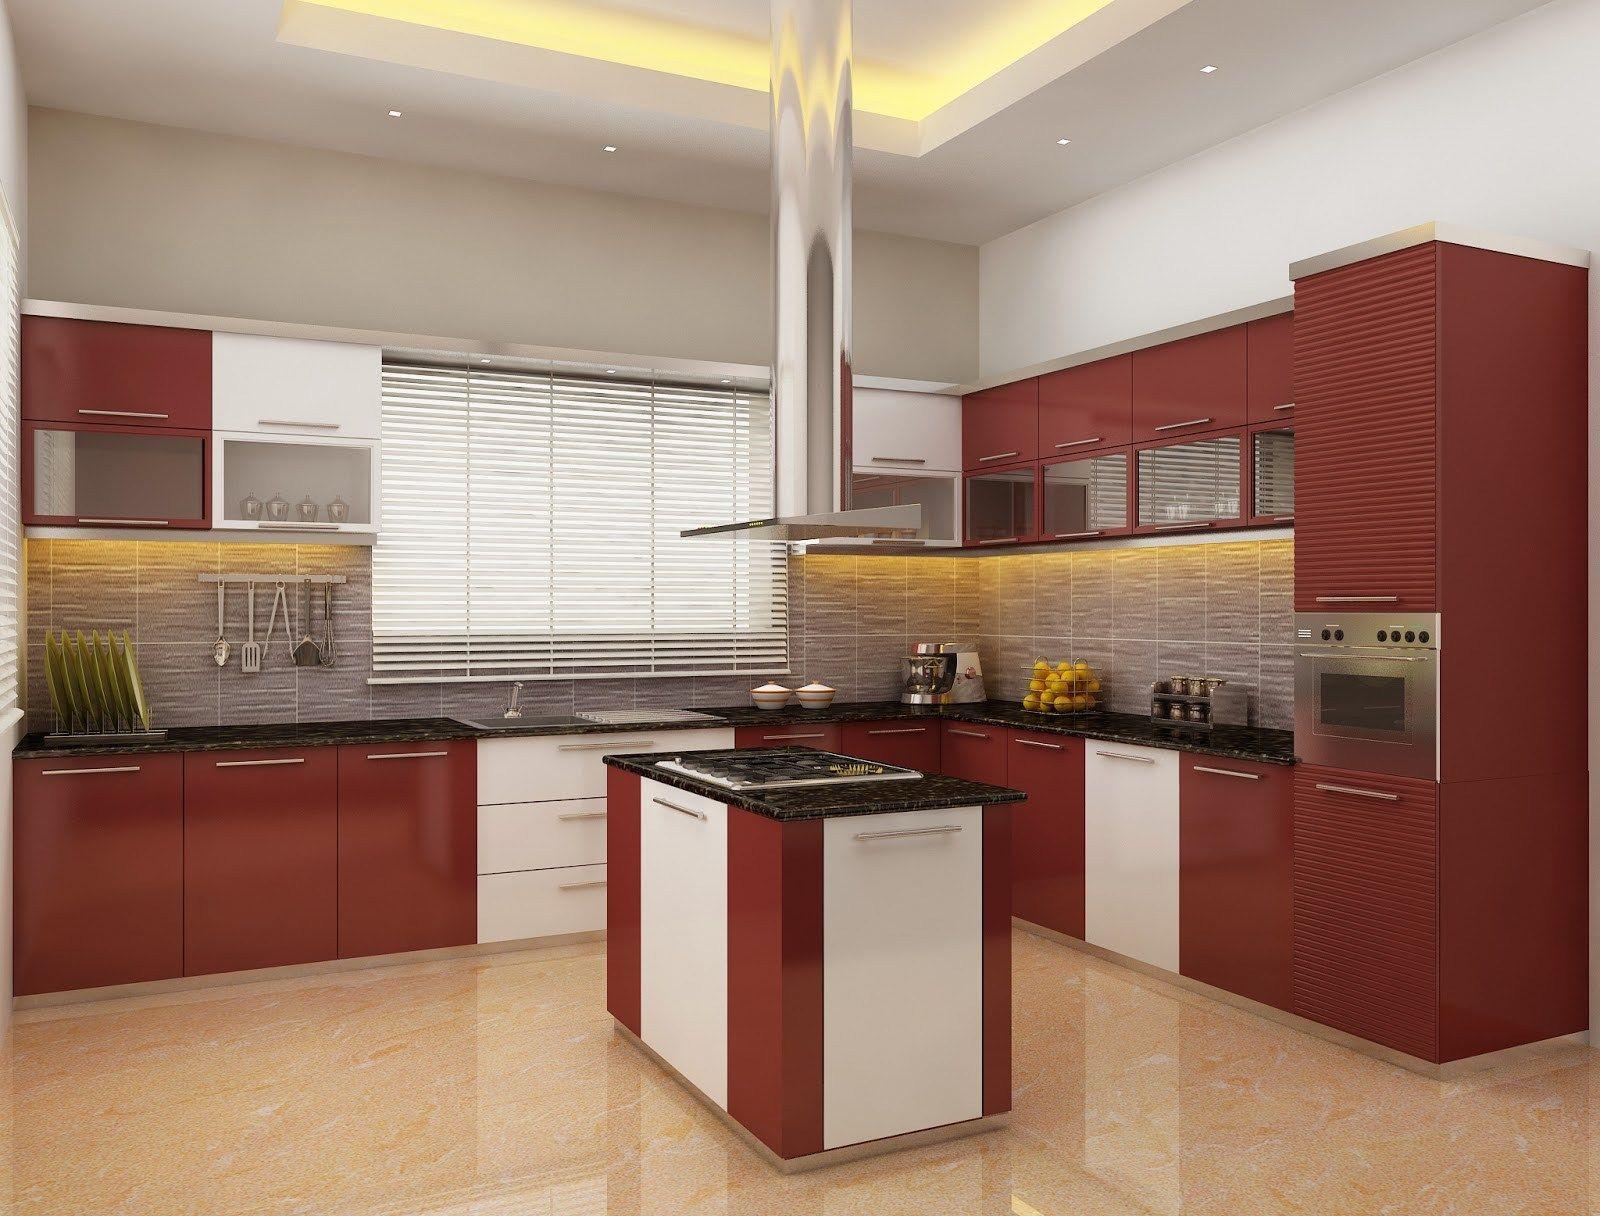 80 Kitchen Designs Kerala Style Ideas Designs Kerala Kitchen Style Kitchendesignke Modern Kitchen Design Kitchen Design Modern Small Kitchen Design Small